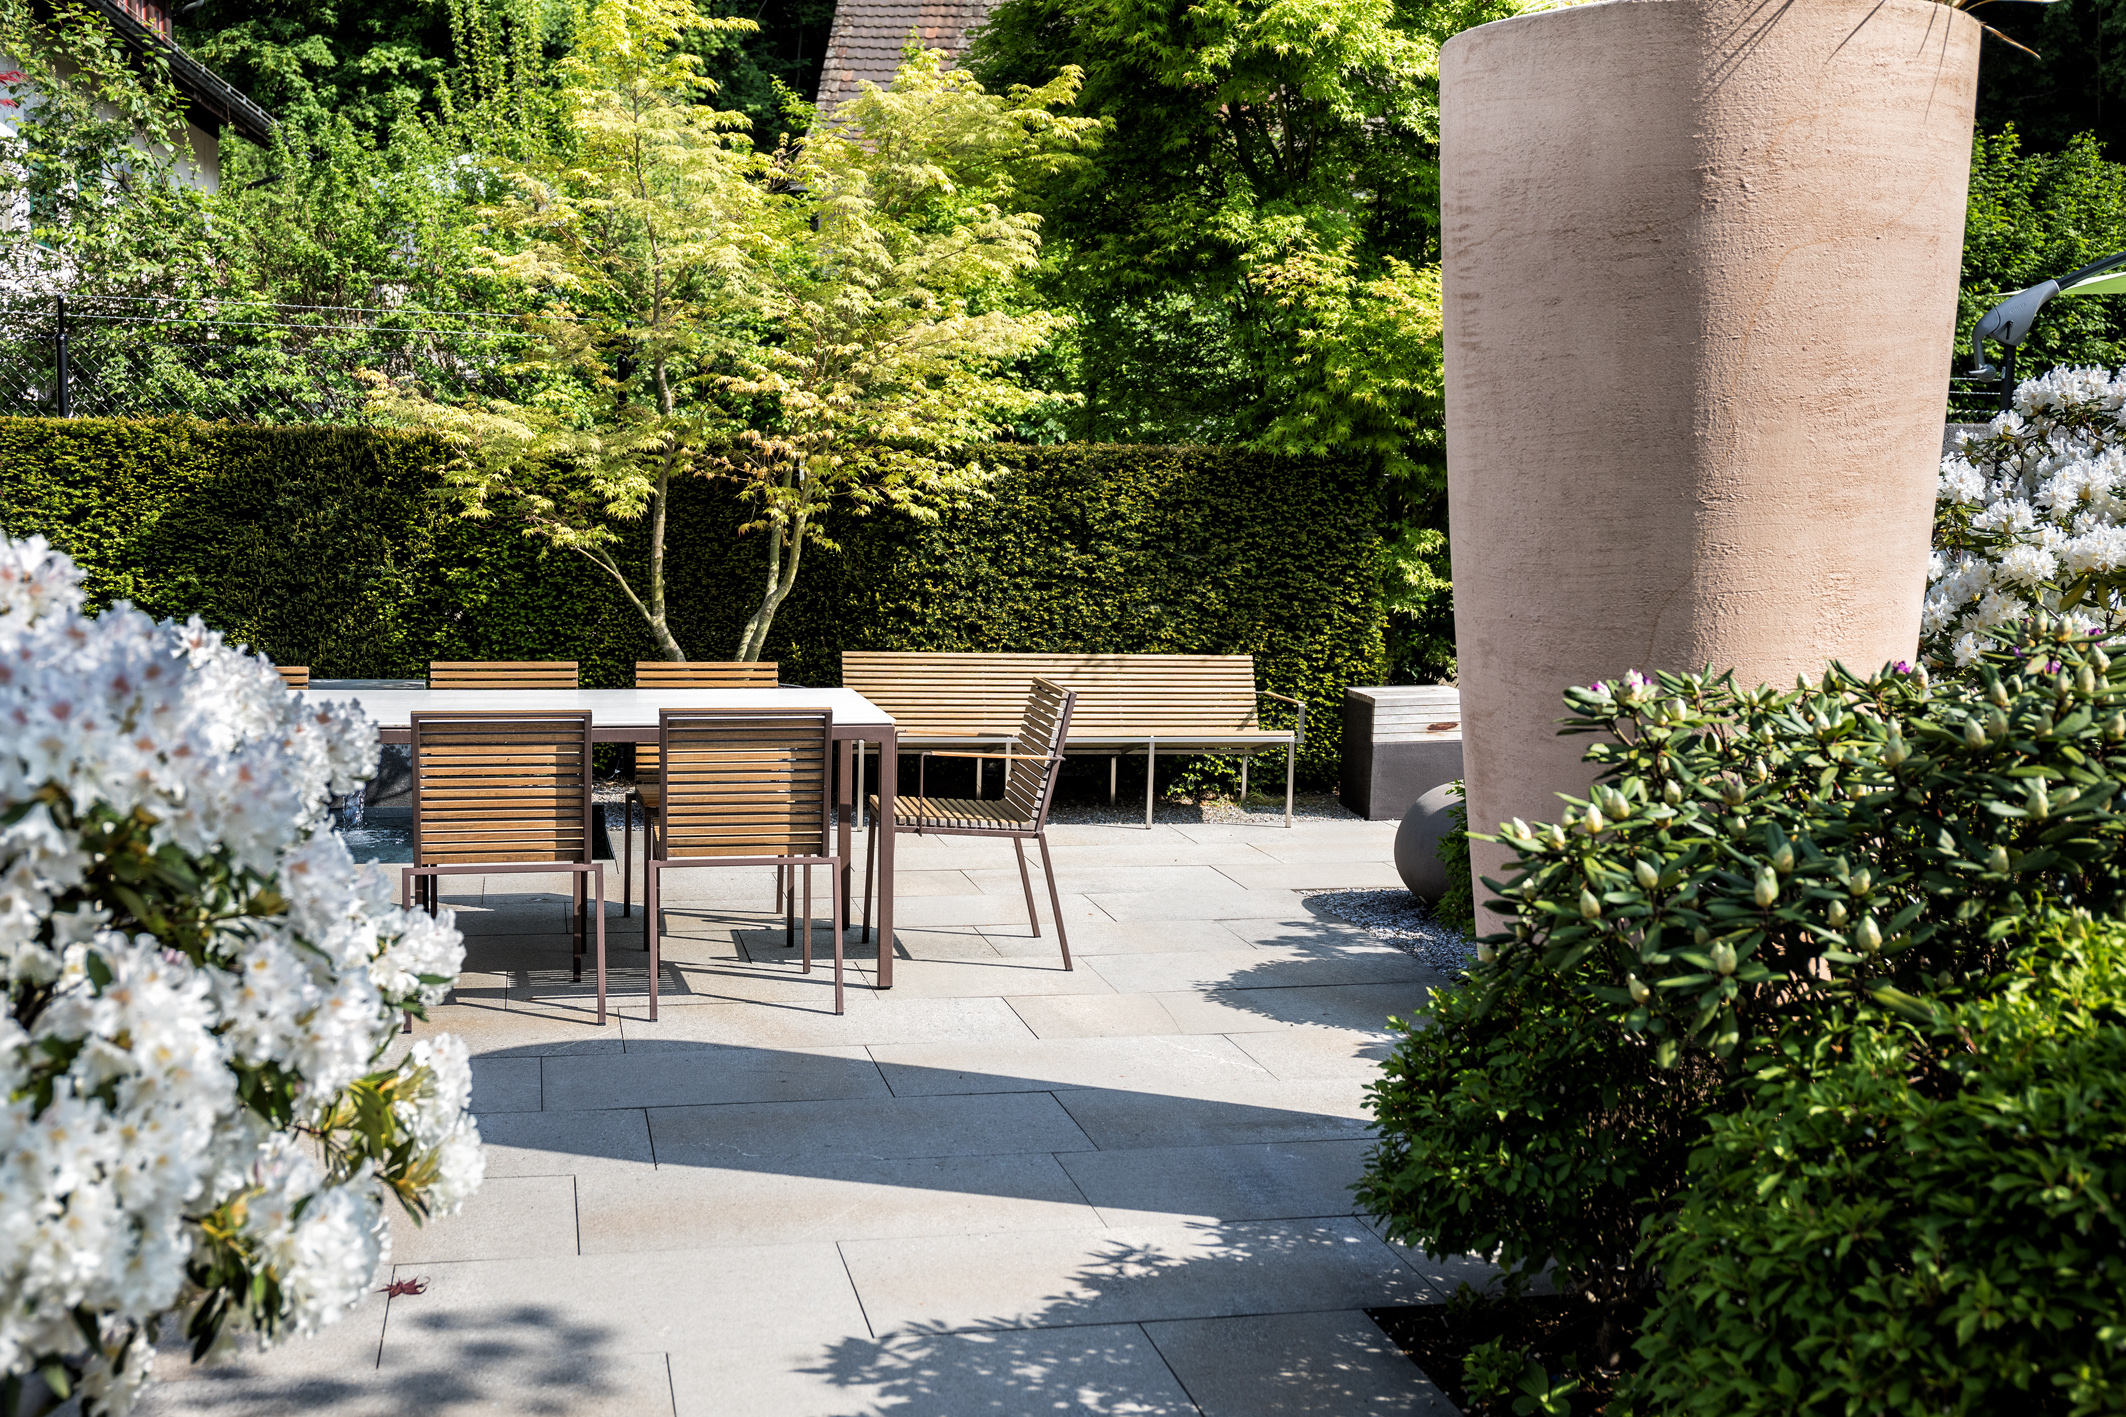 Inspiration Gartengestaltung: Viteo-Möbel